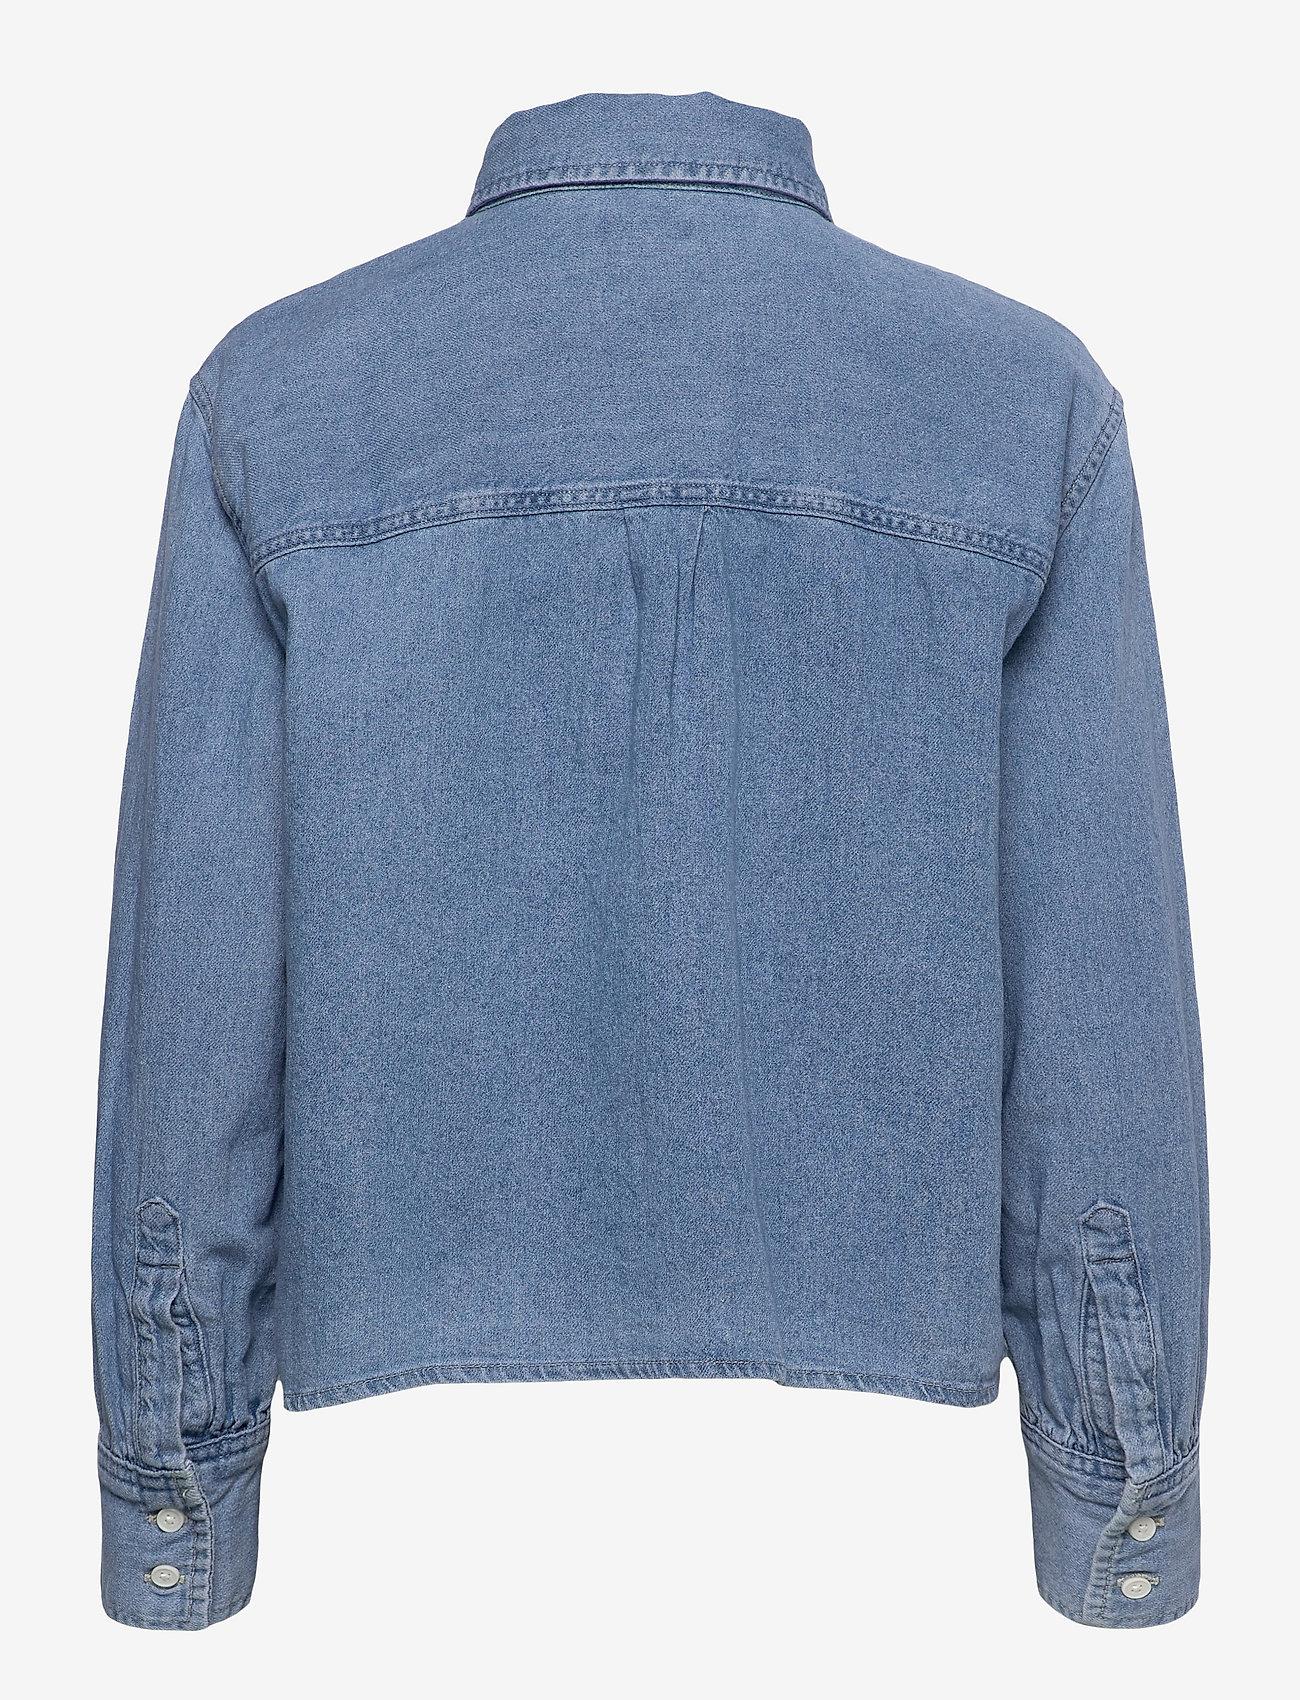 LEVI´S Women - ZOEY PLEAT UTILITY SHIRT STAY - langærmede skjorter - med indigo - flat finish - 1